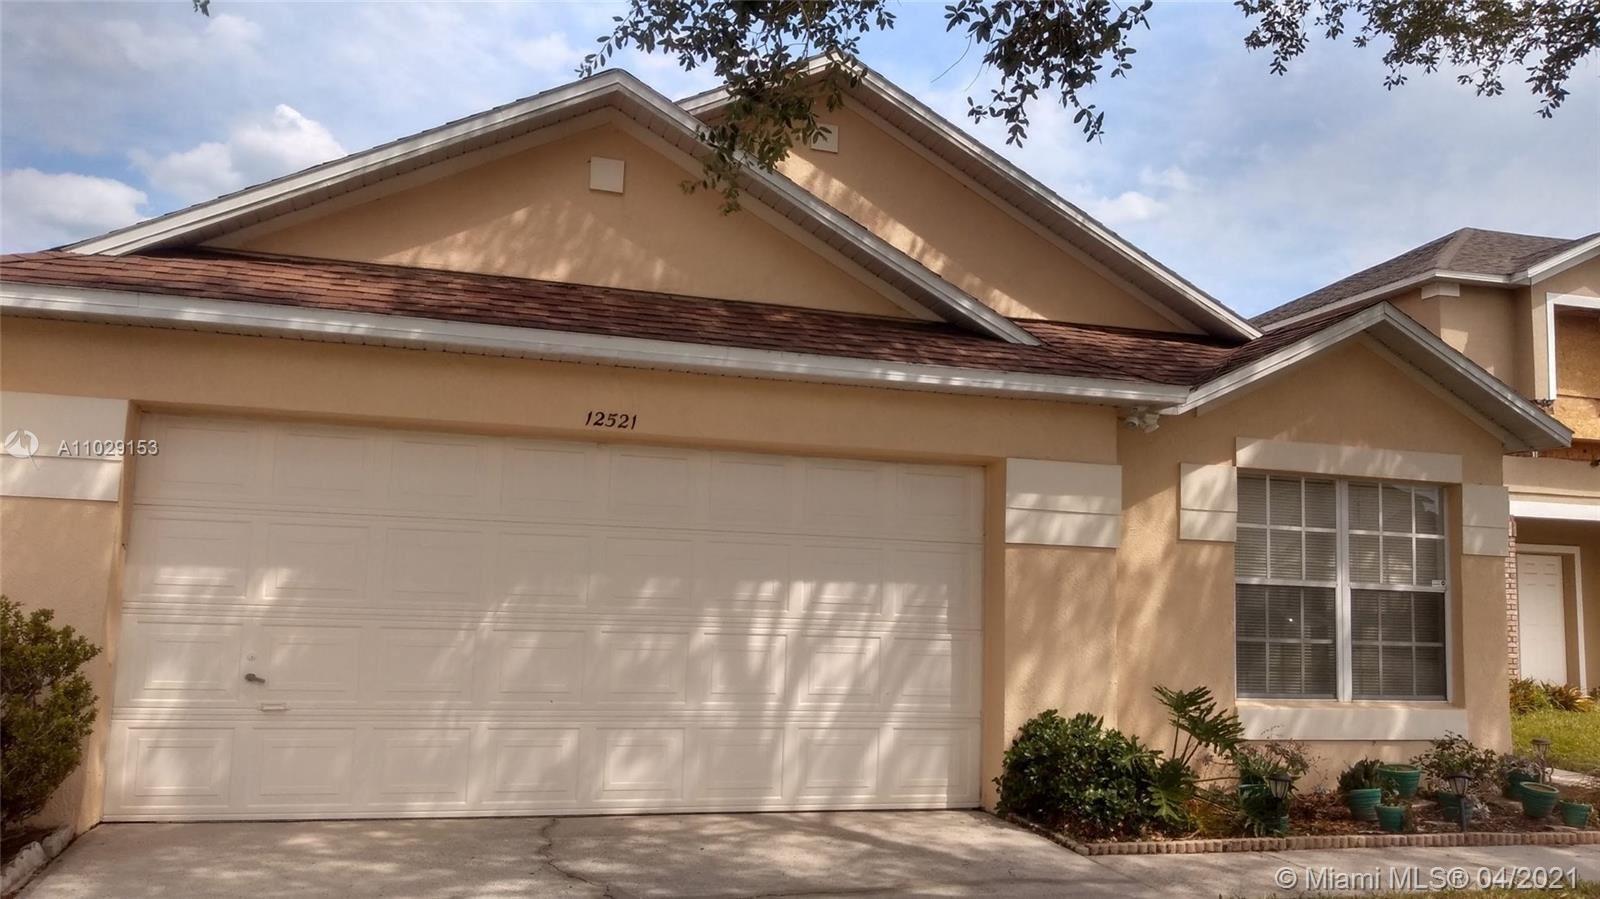 Photo of 12521 Beacontree Way, Orlando, FL 32837 (MLS # A11029153)